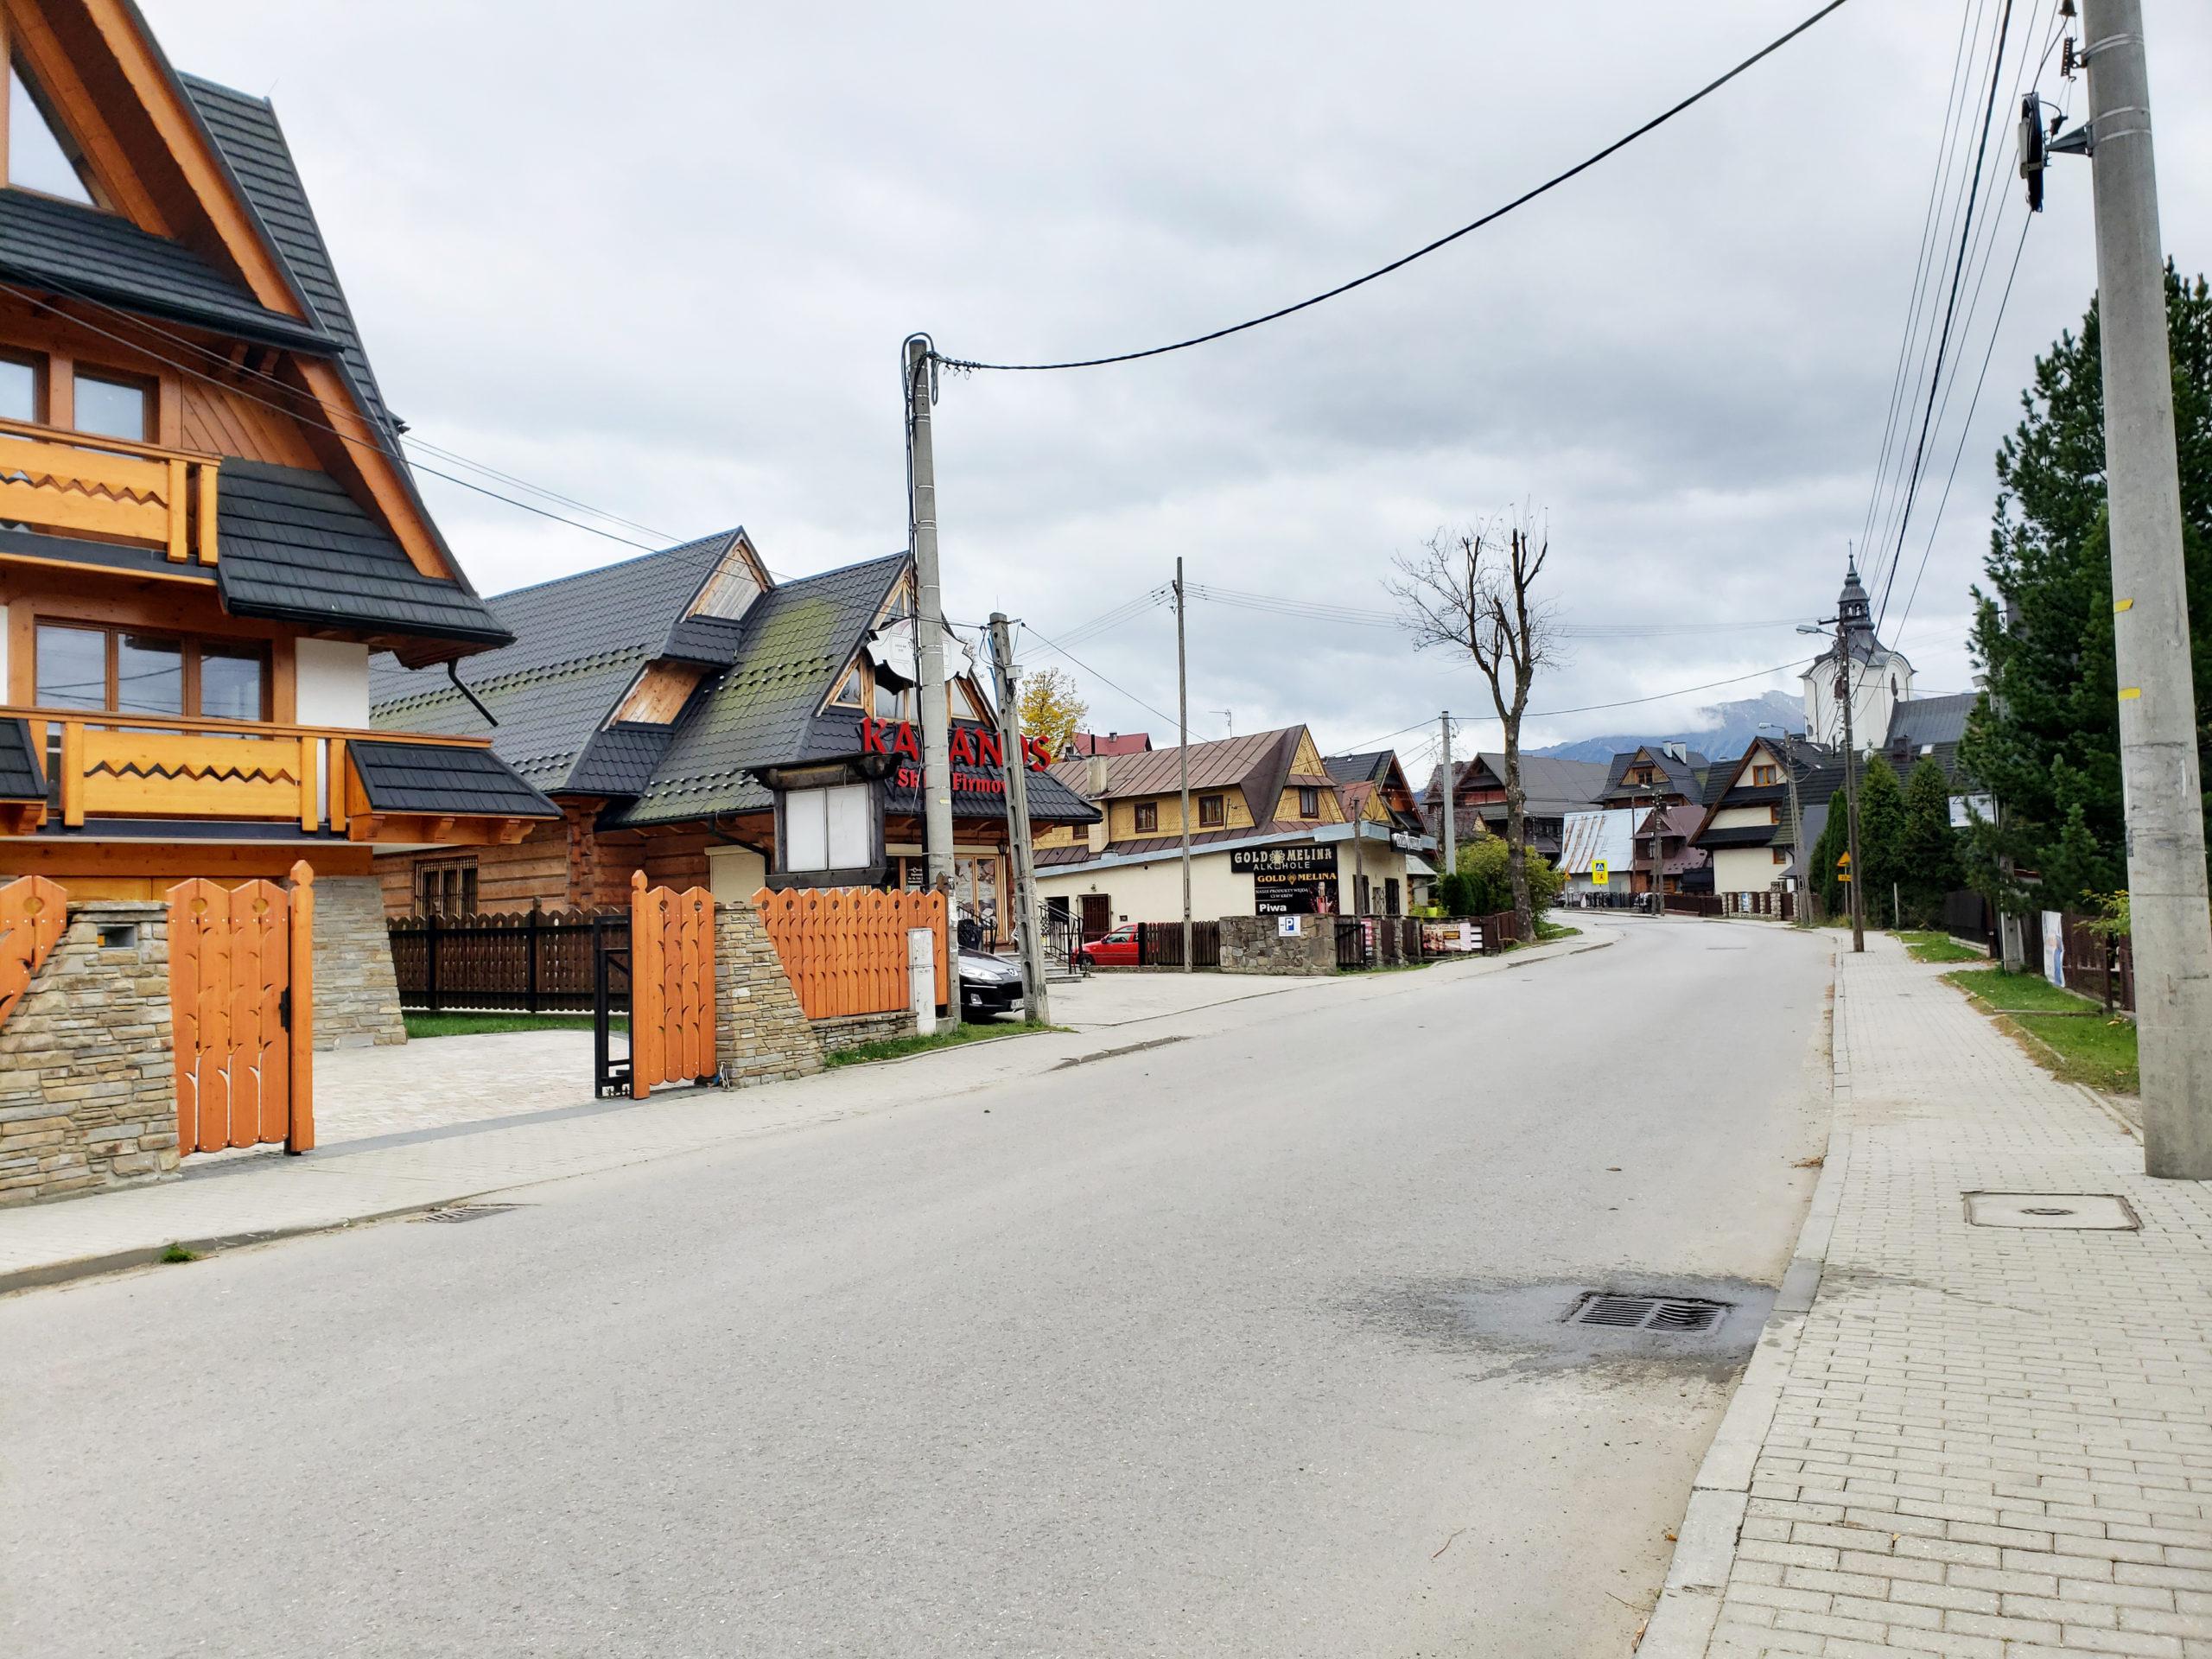 2 Days In The Quaint Village Of Poronin, Poland